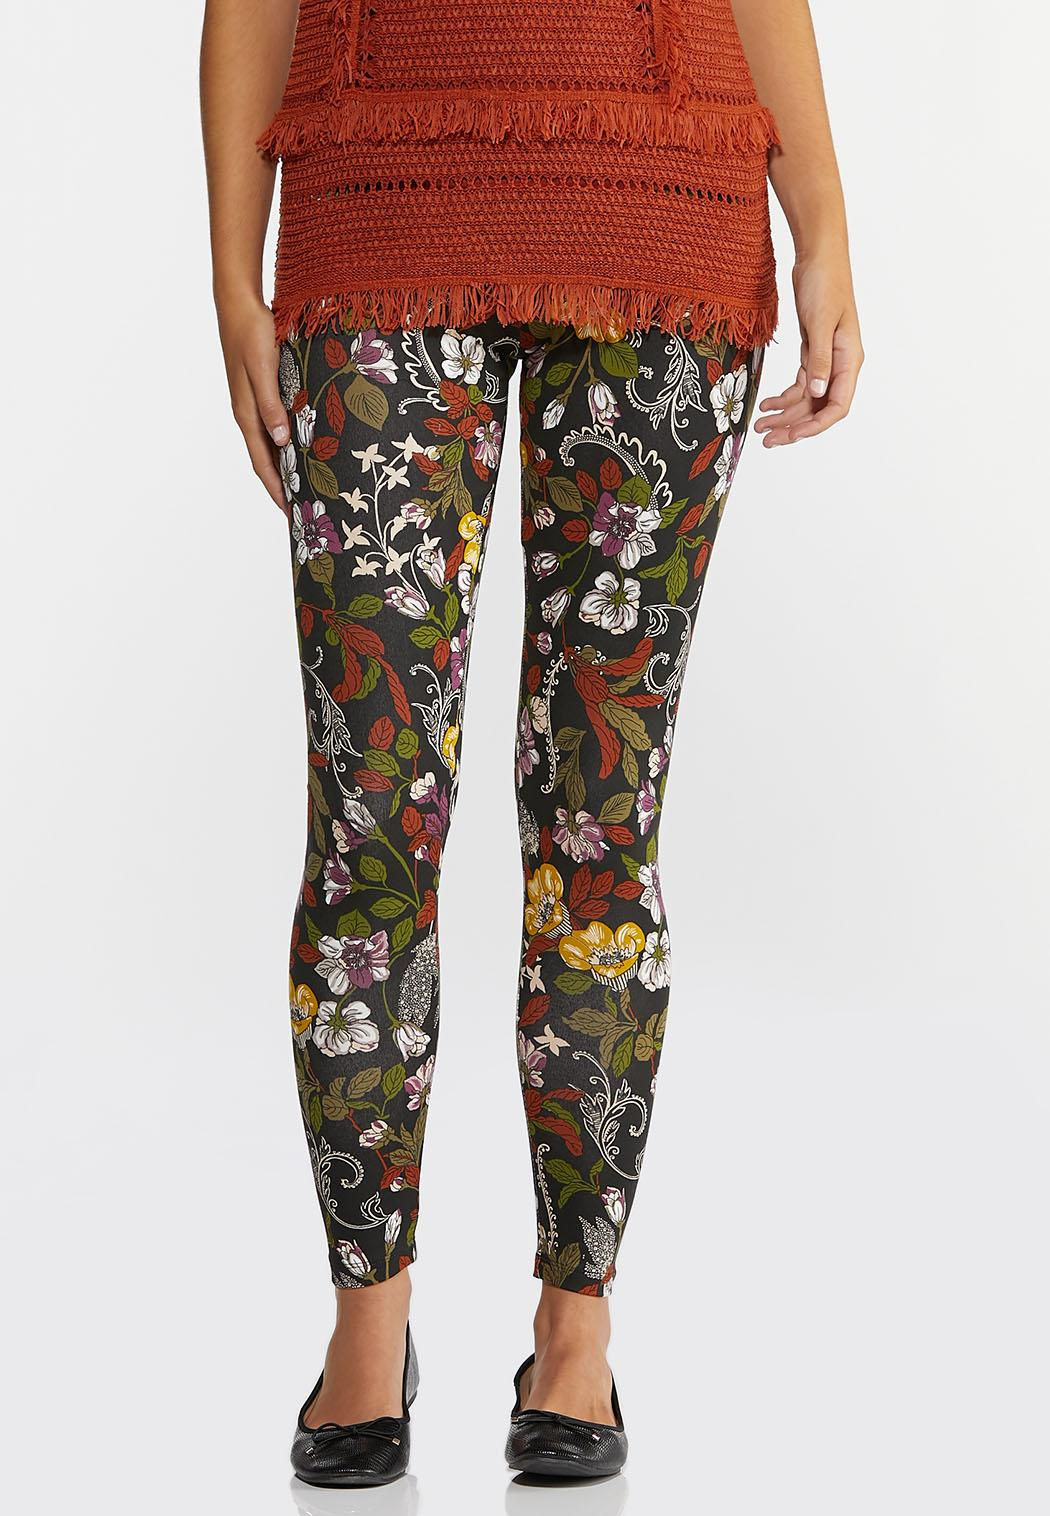 Garden Floral Leggings